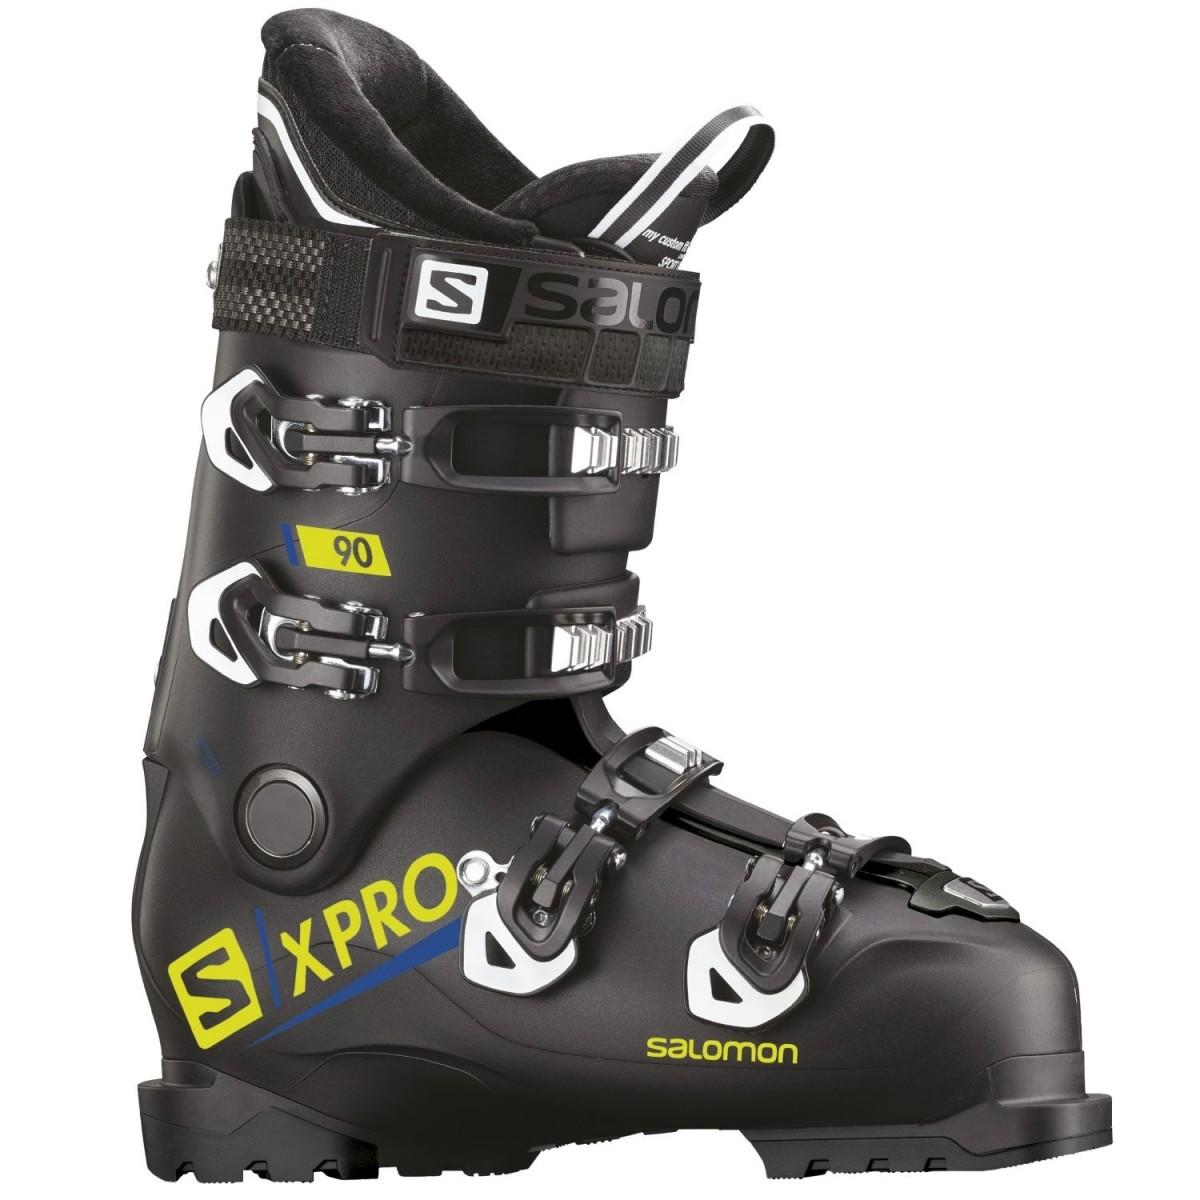 Salomon X Pro 90 Skischuhe